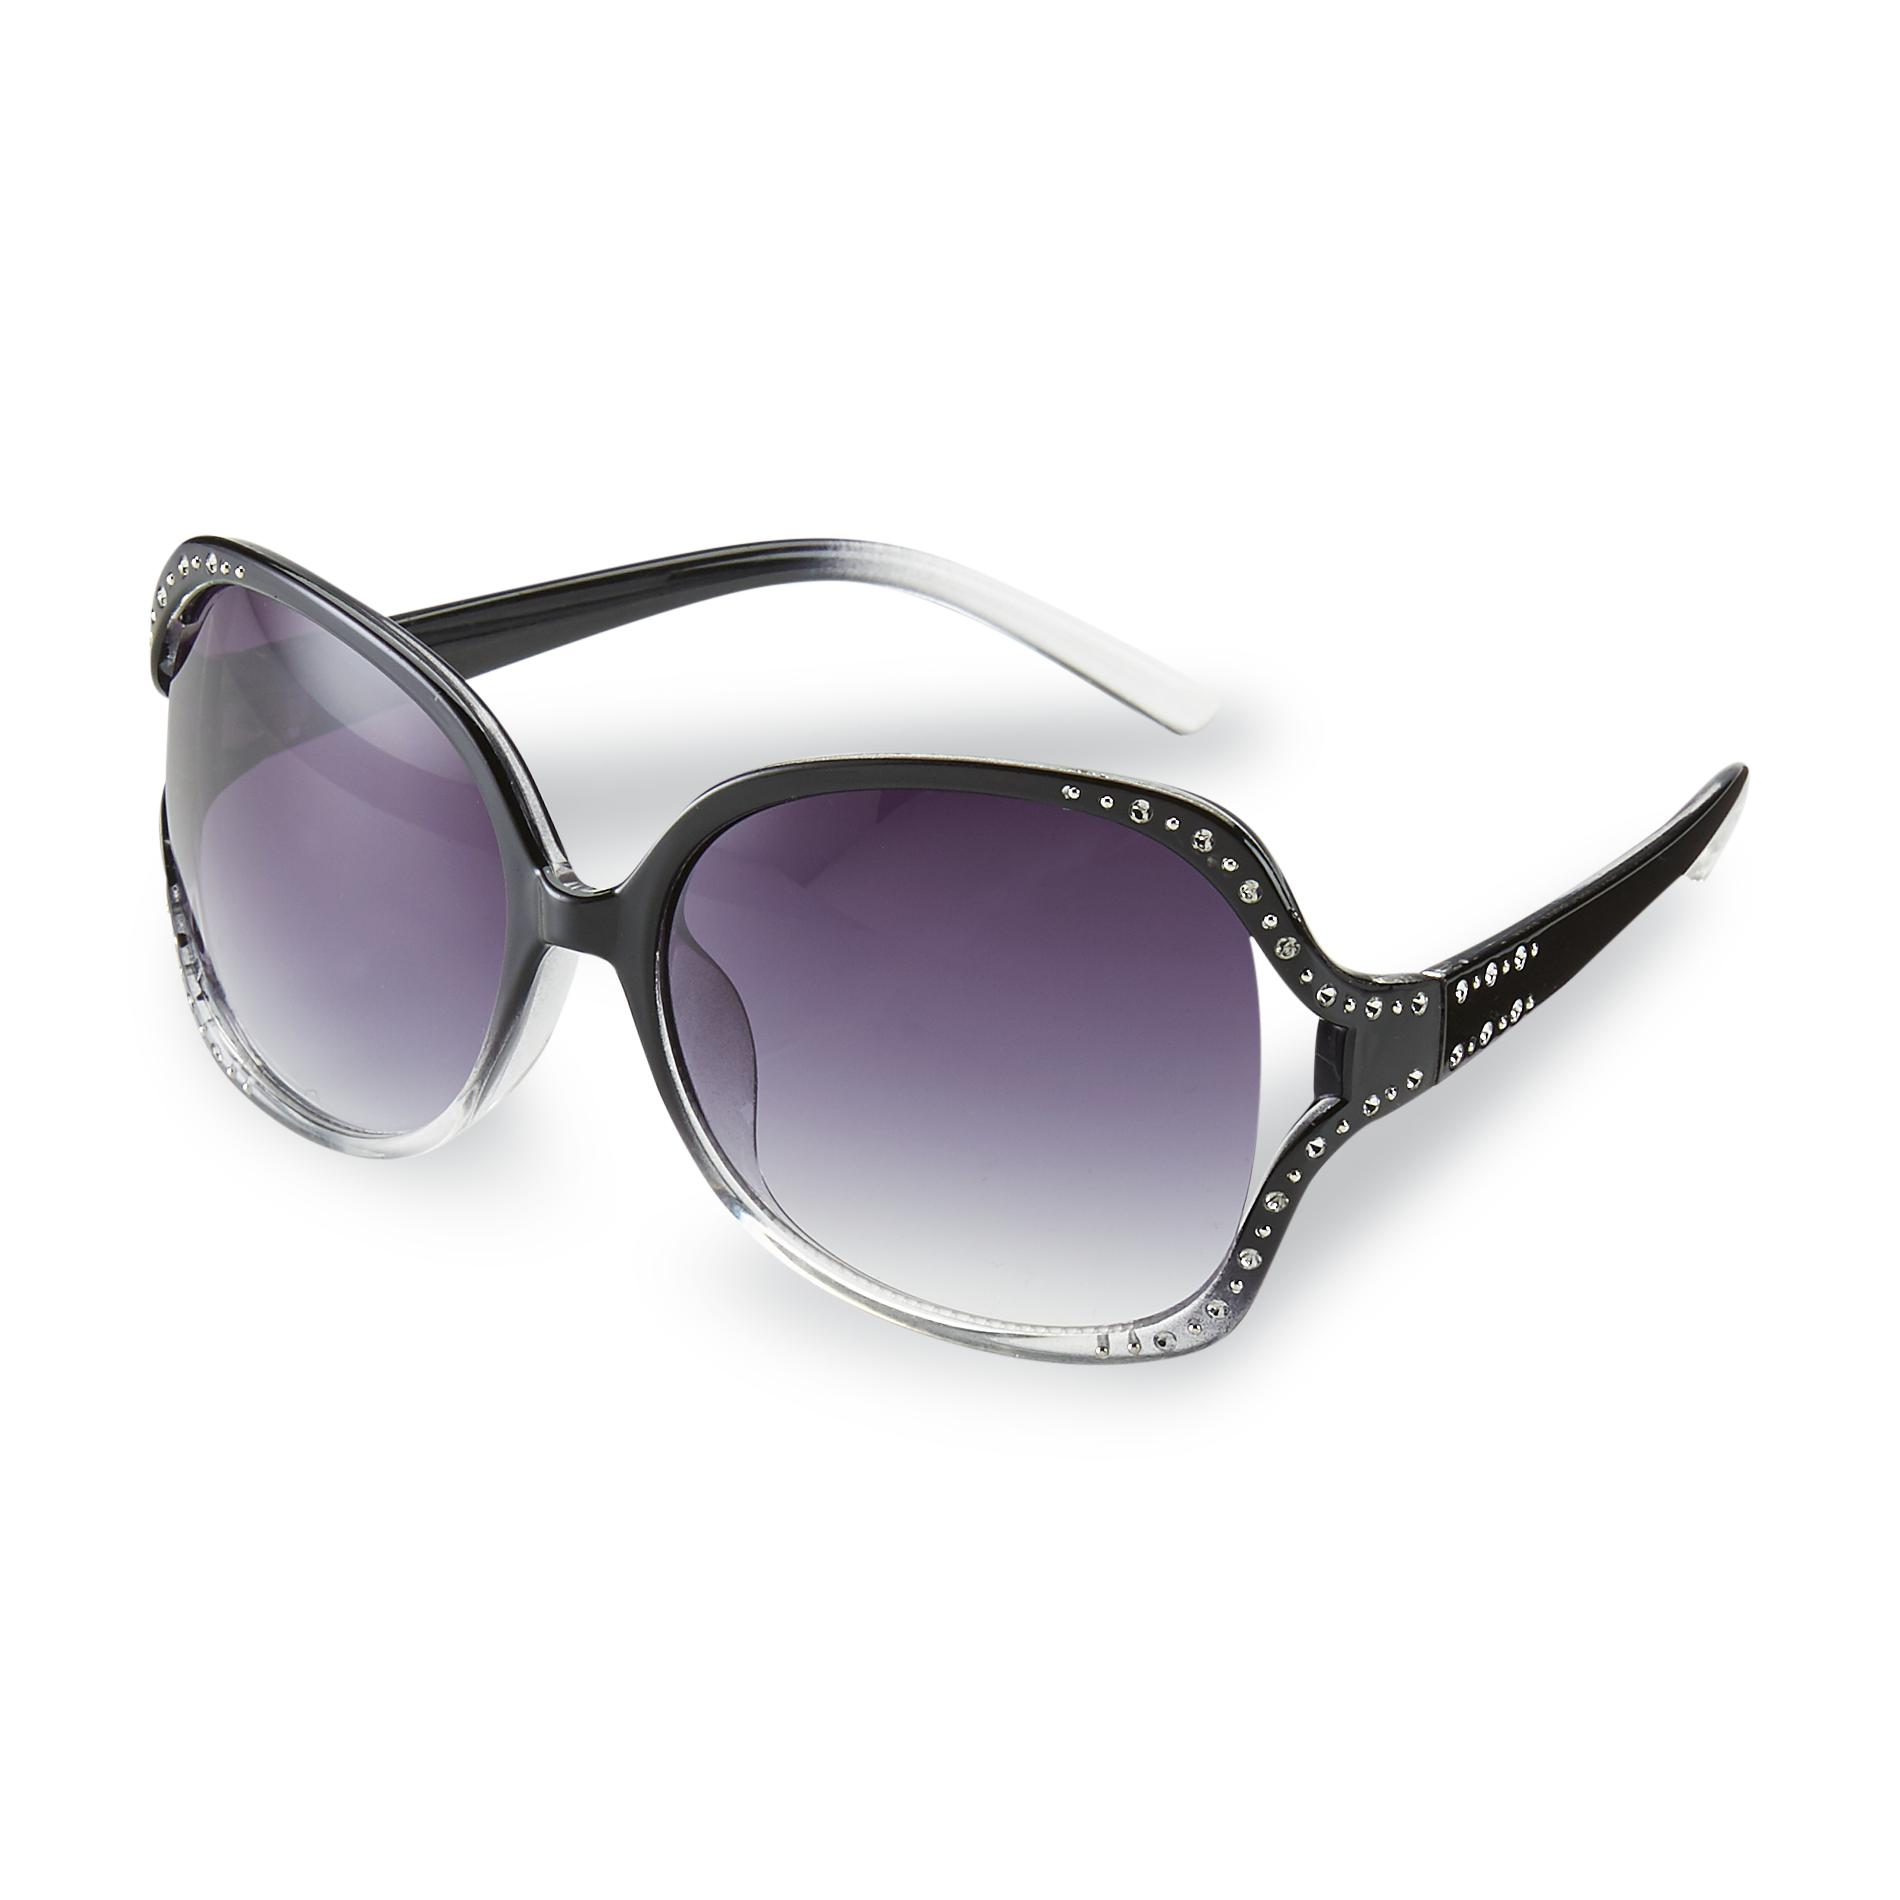 Attention Women's Oversized Round Sunglasses